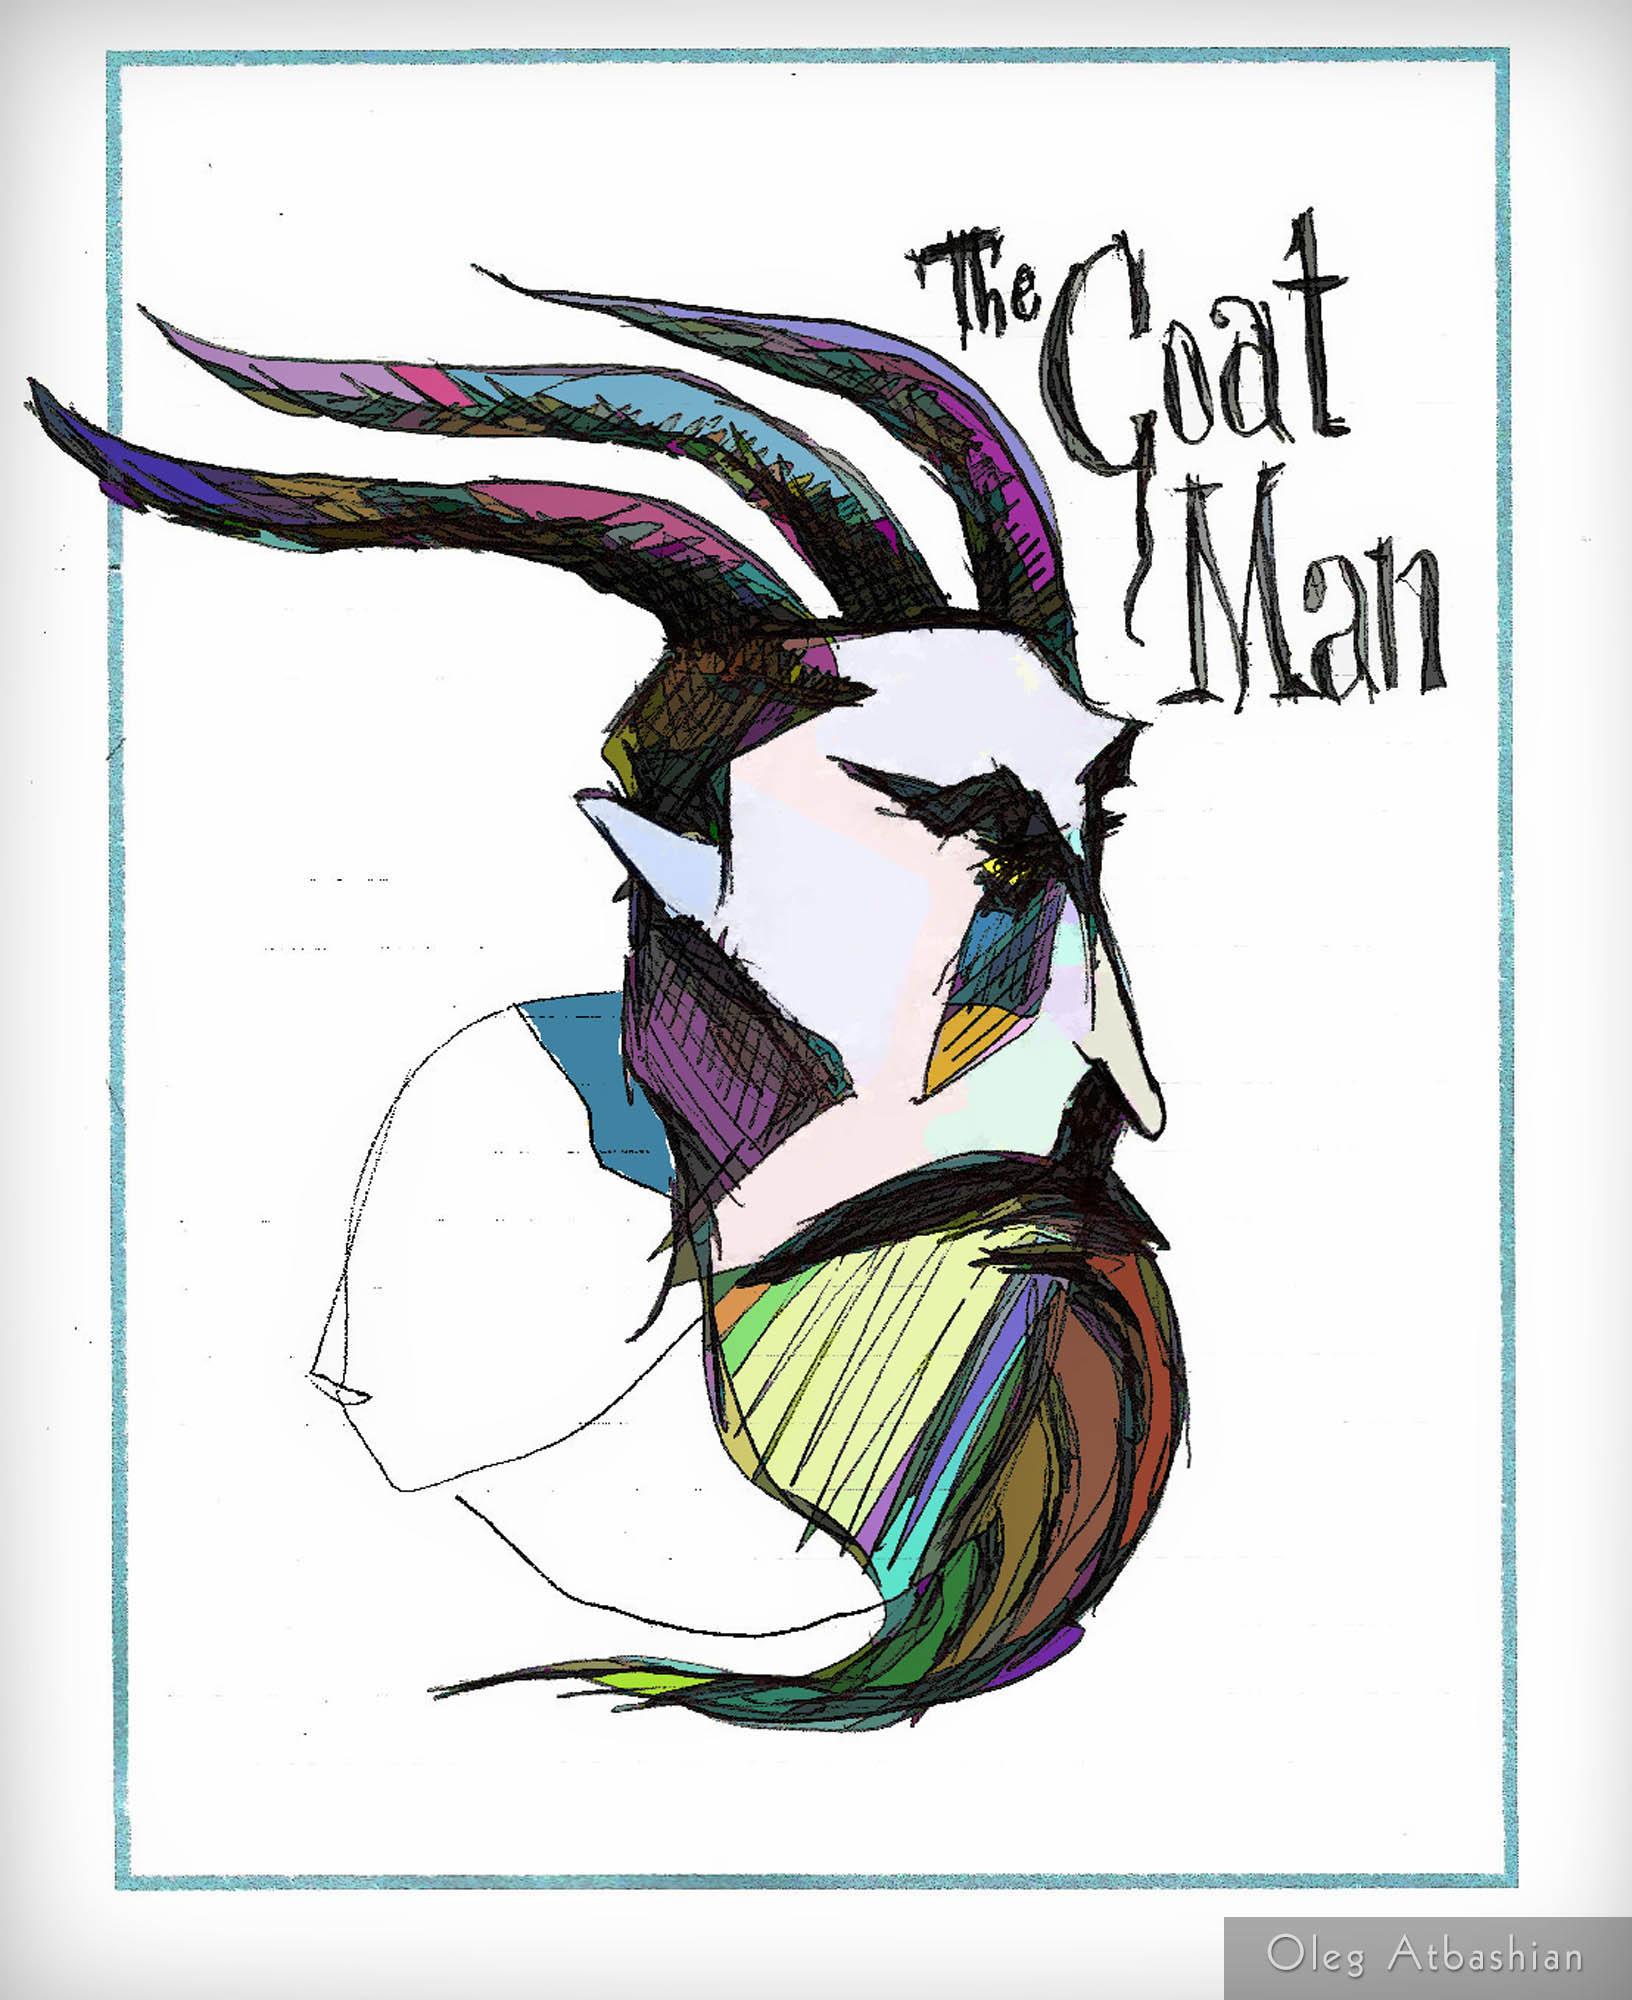 Cartoon: The Goat Man